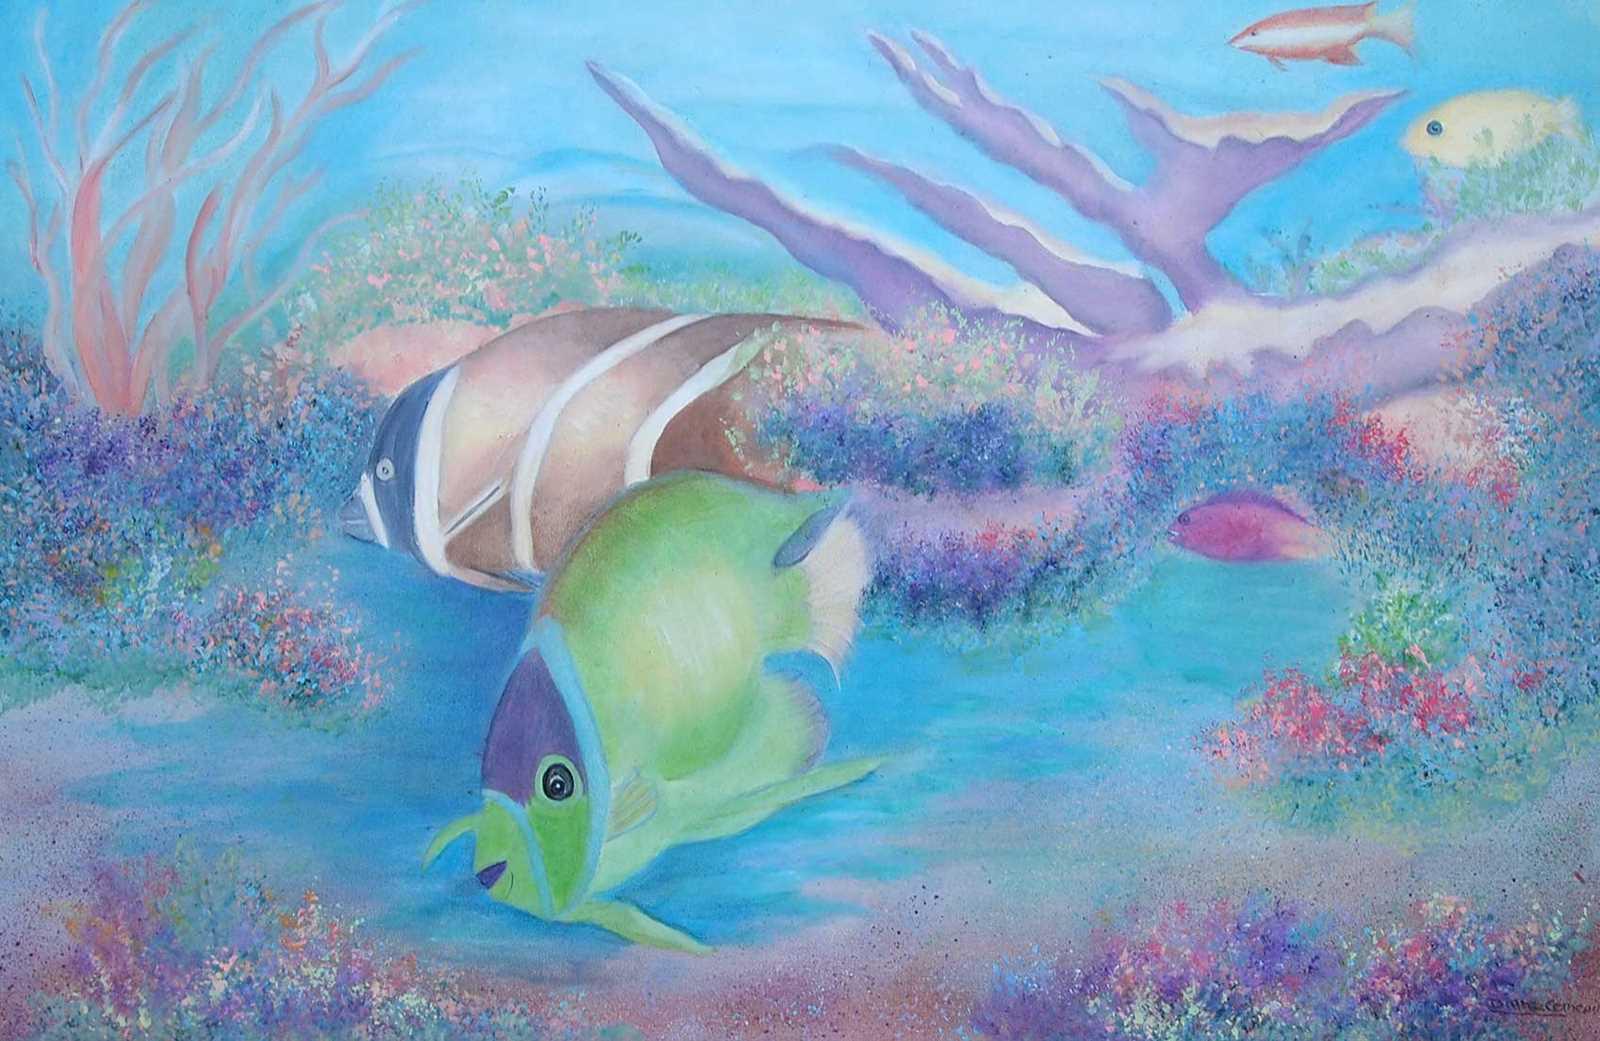 Green Parrot Fish